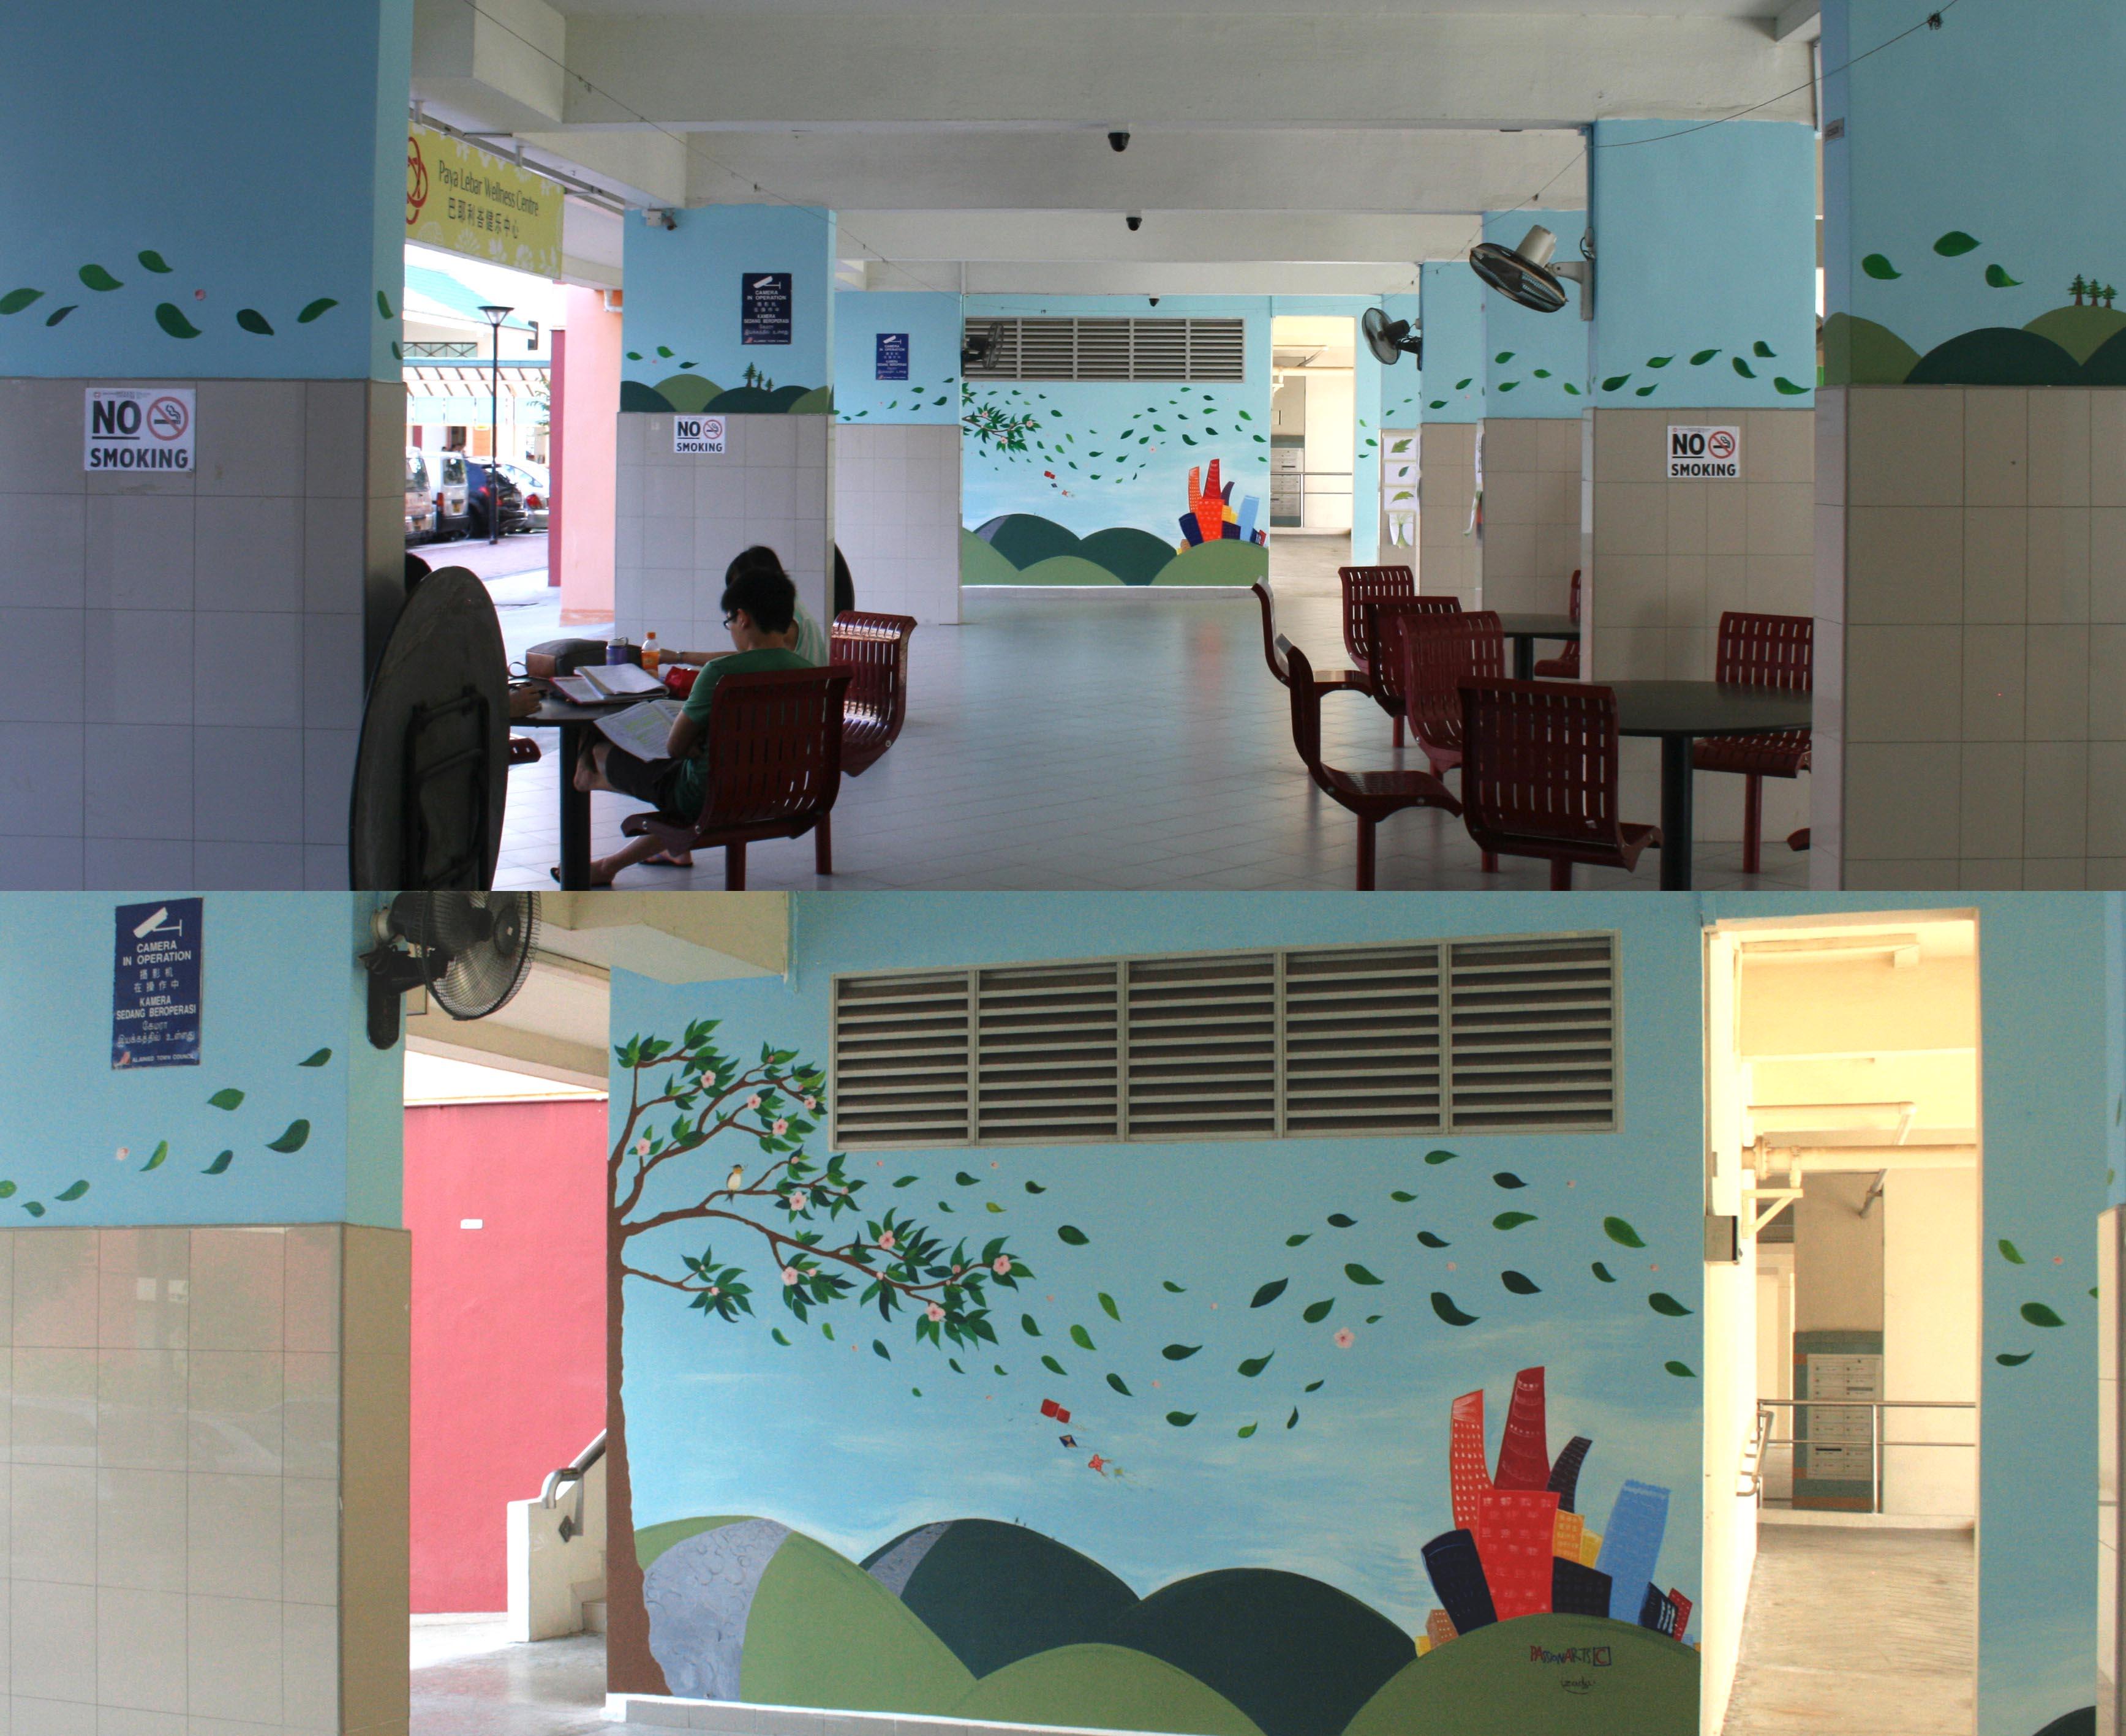 Community Based Project - Singapore